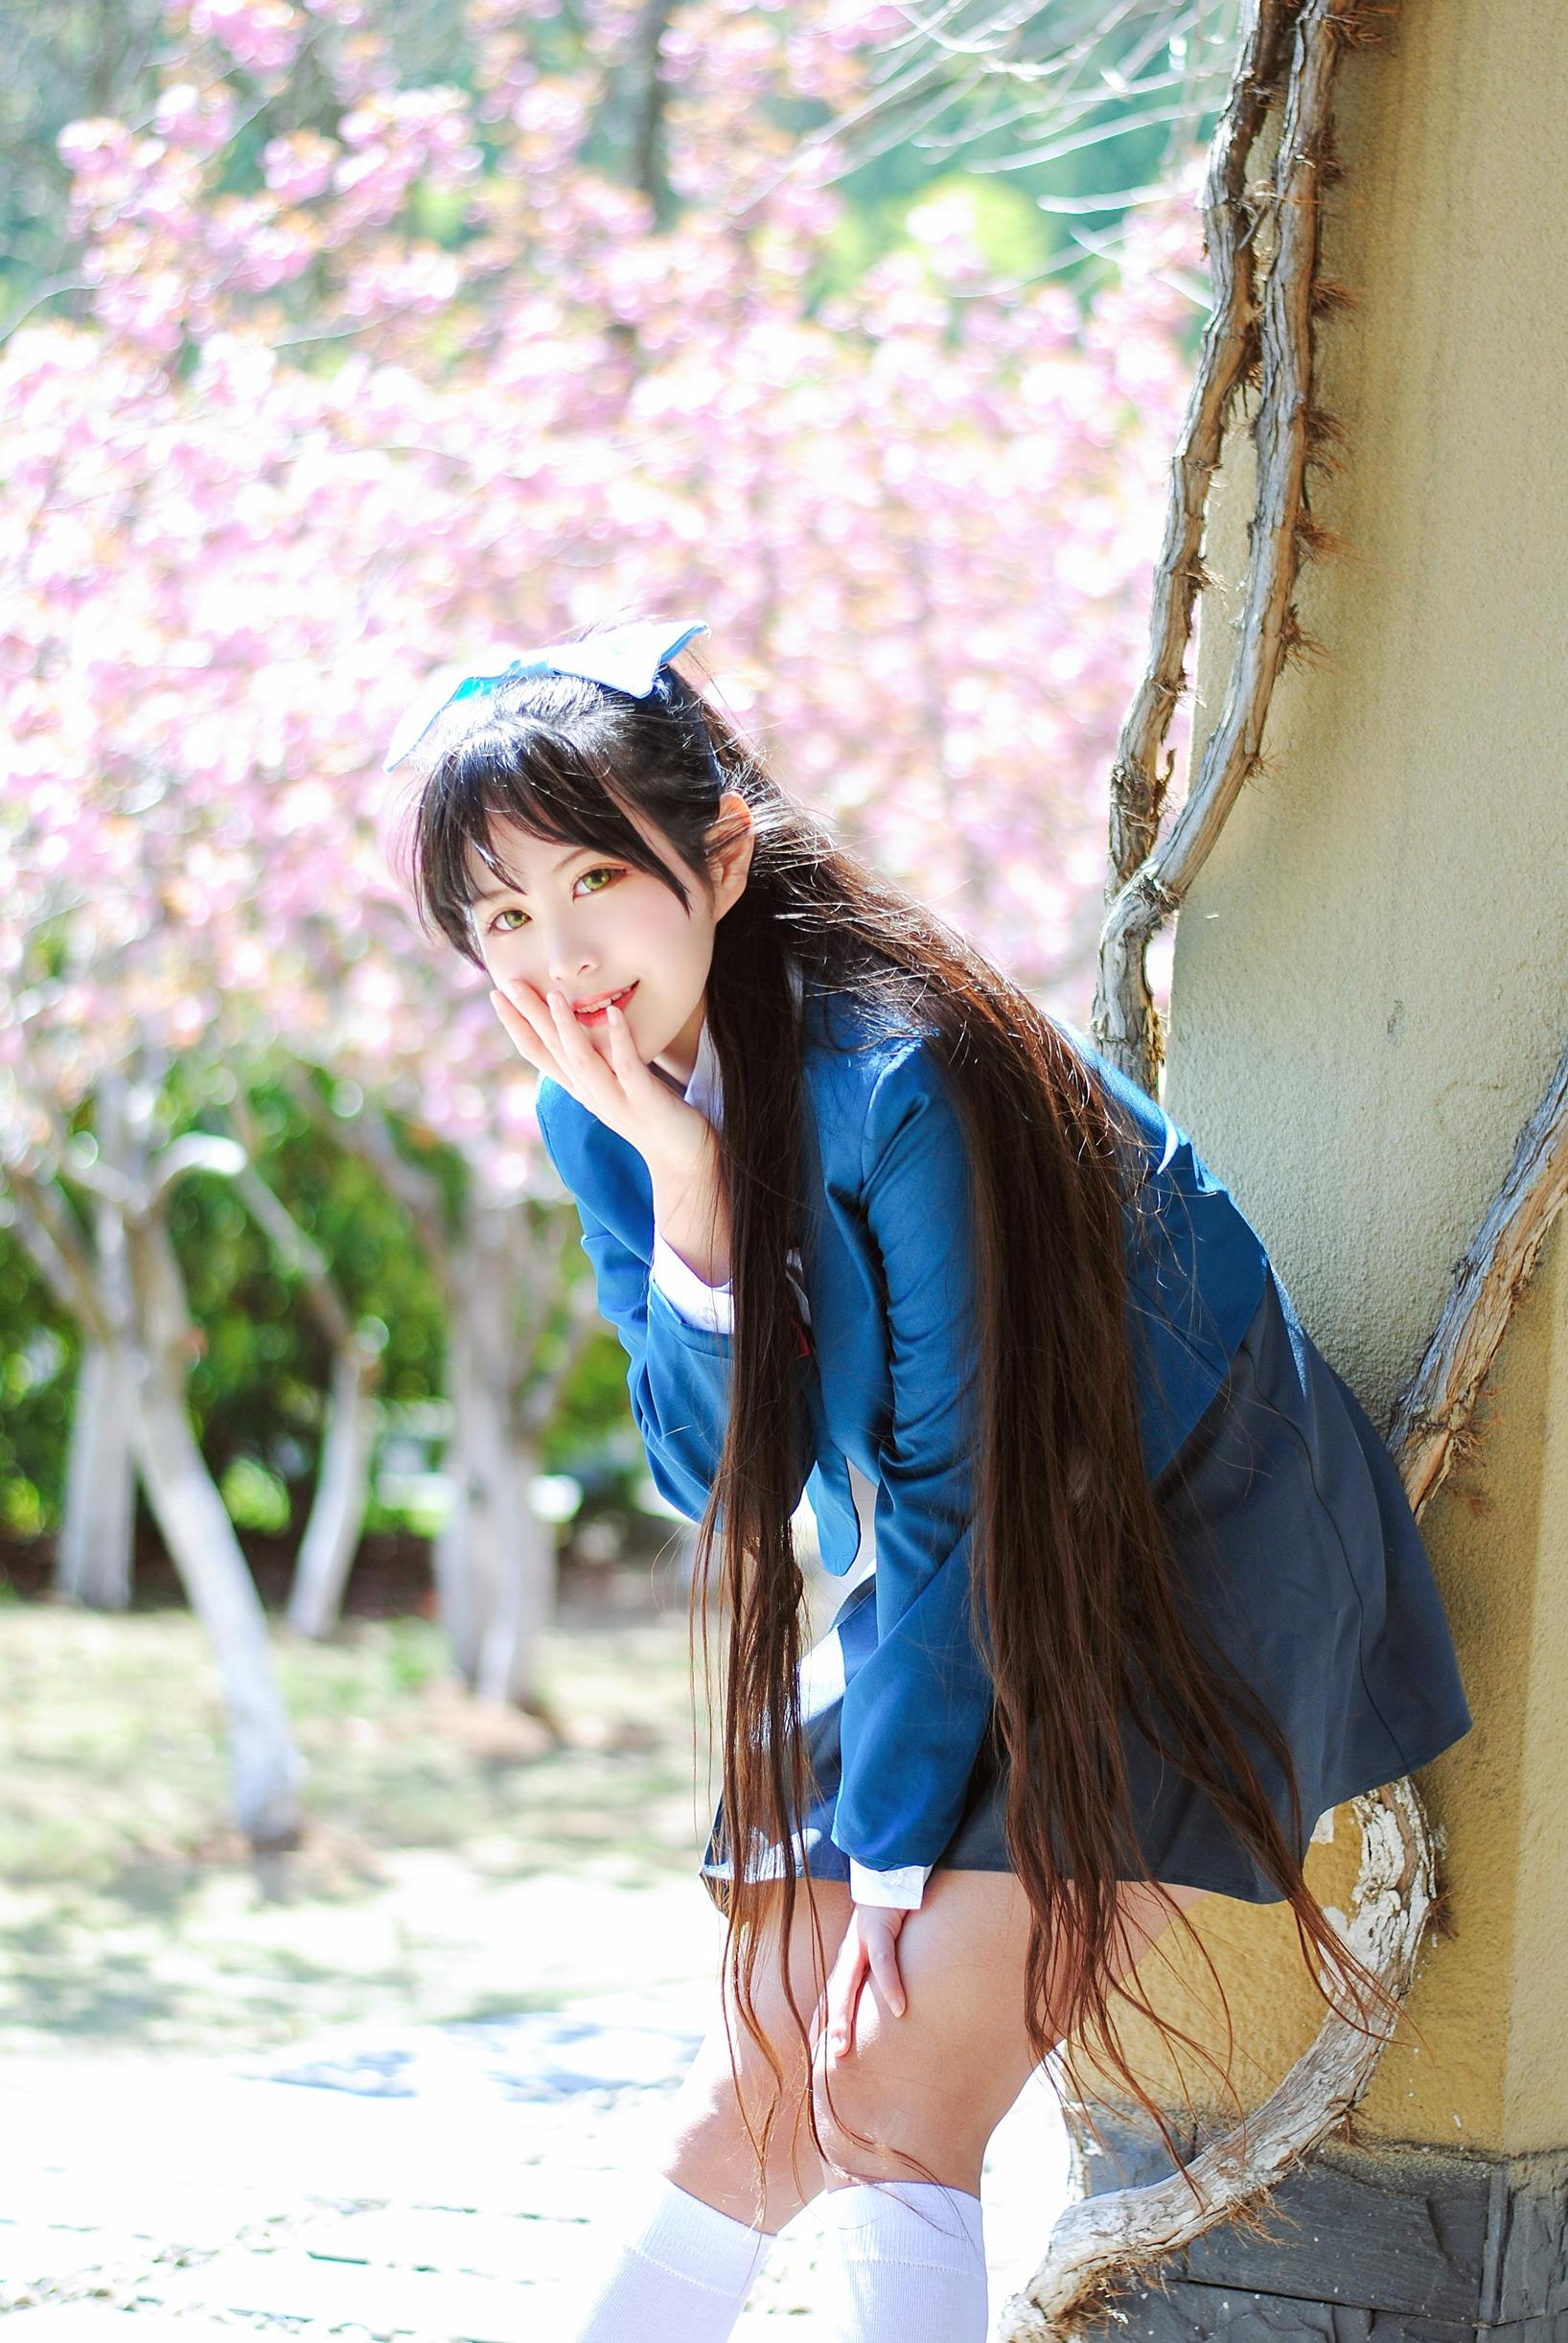 《LOVE LIVE!》美少女cosplay【CN:_李笑颜Lee】-第9张